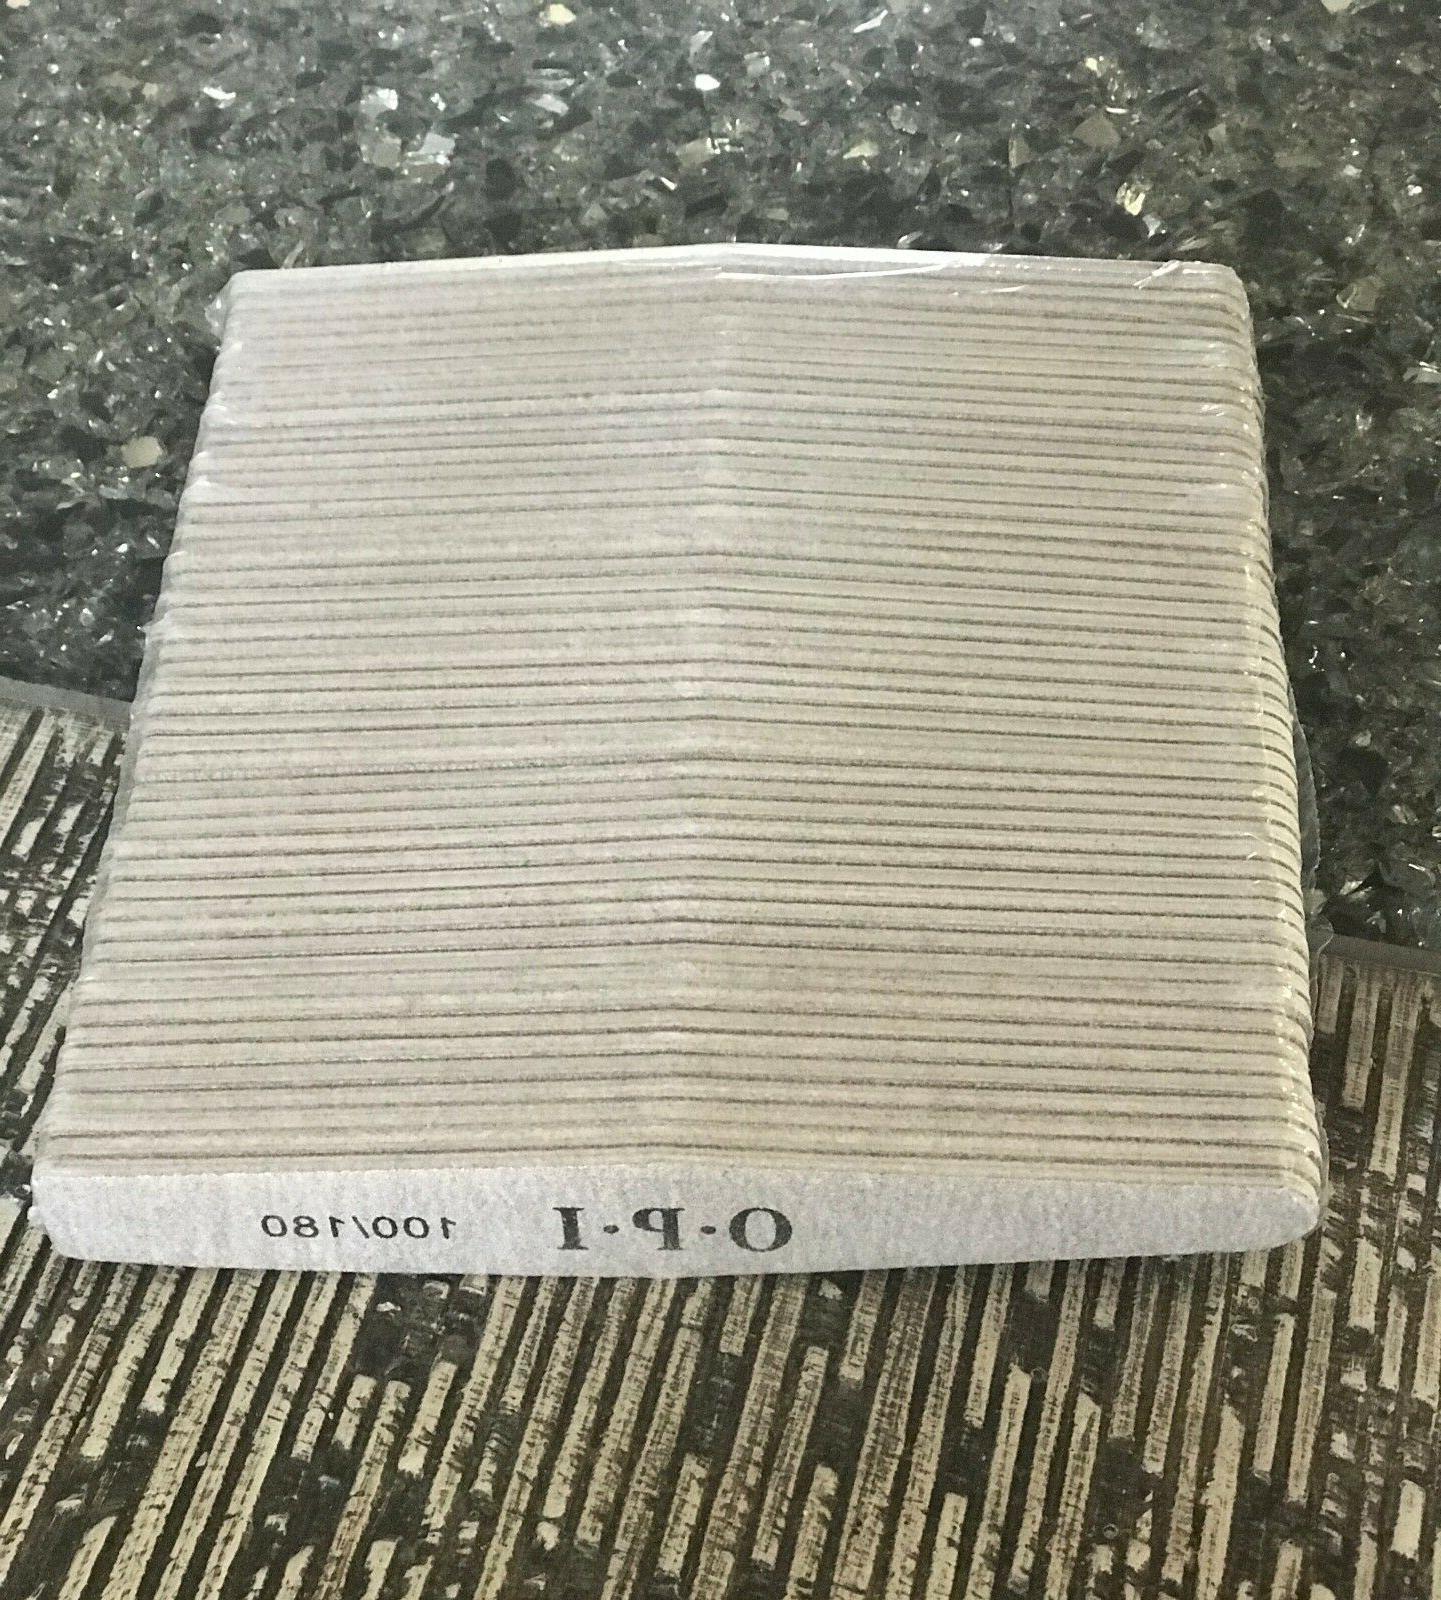 OPI ACR UV Gel 100/180 Manicure NEW SALE